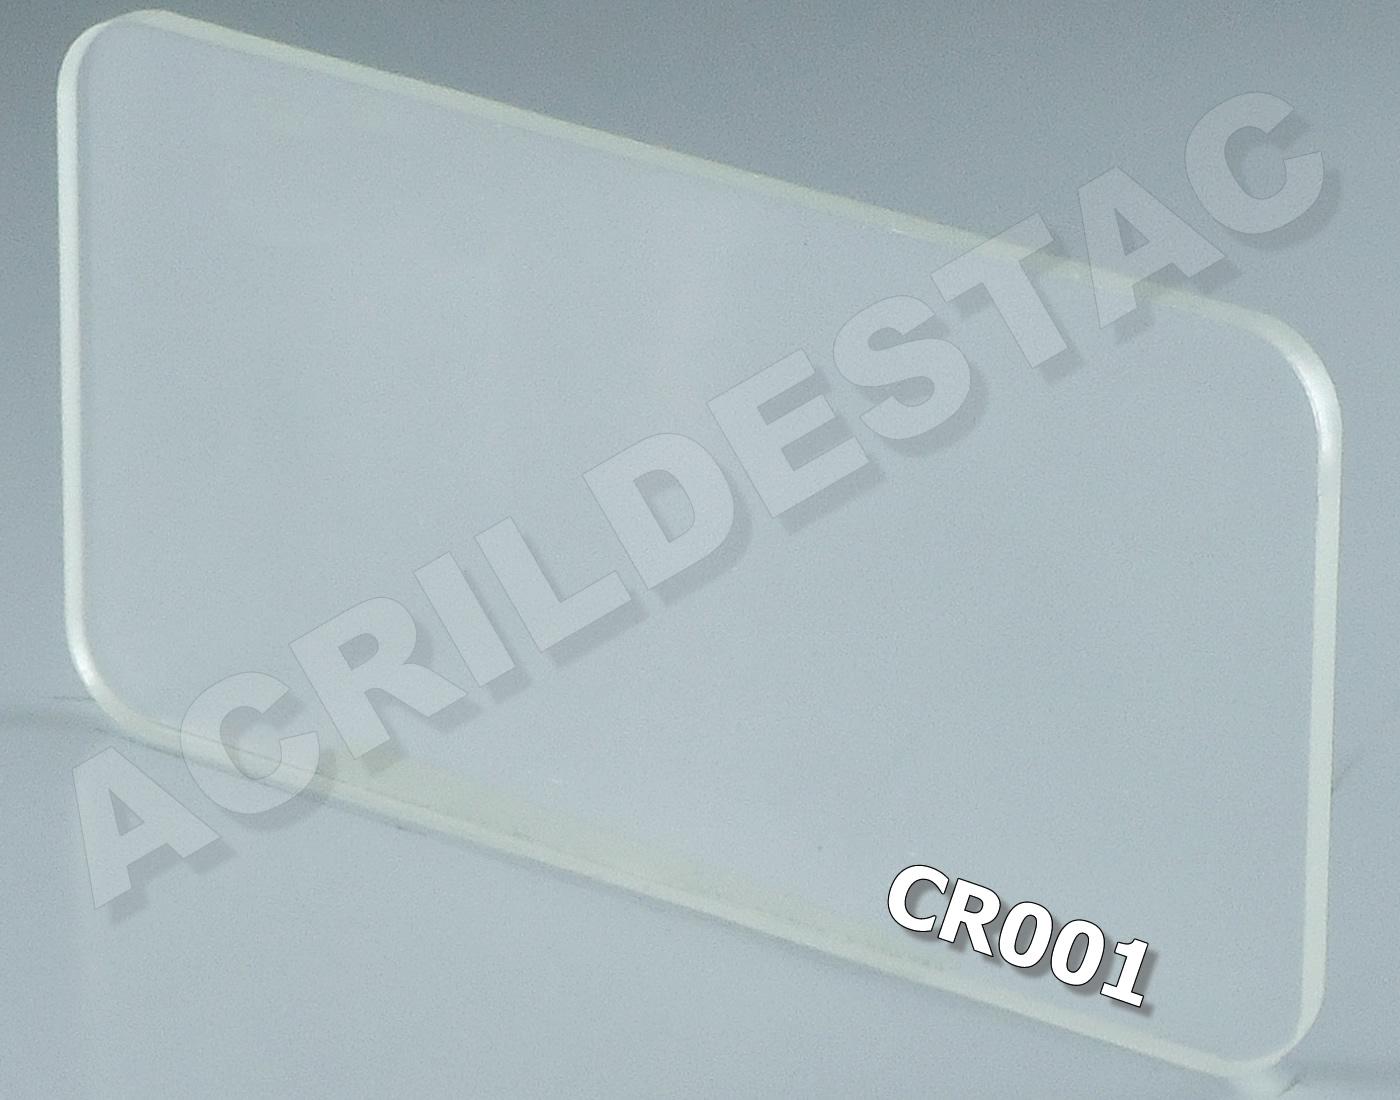 1 x 1 metro - 8mm - CRISTAL Transparente PL-CR001 -